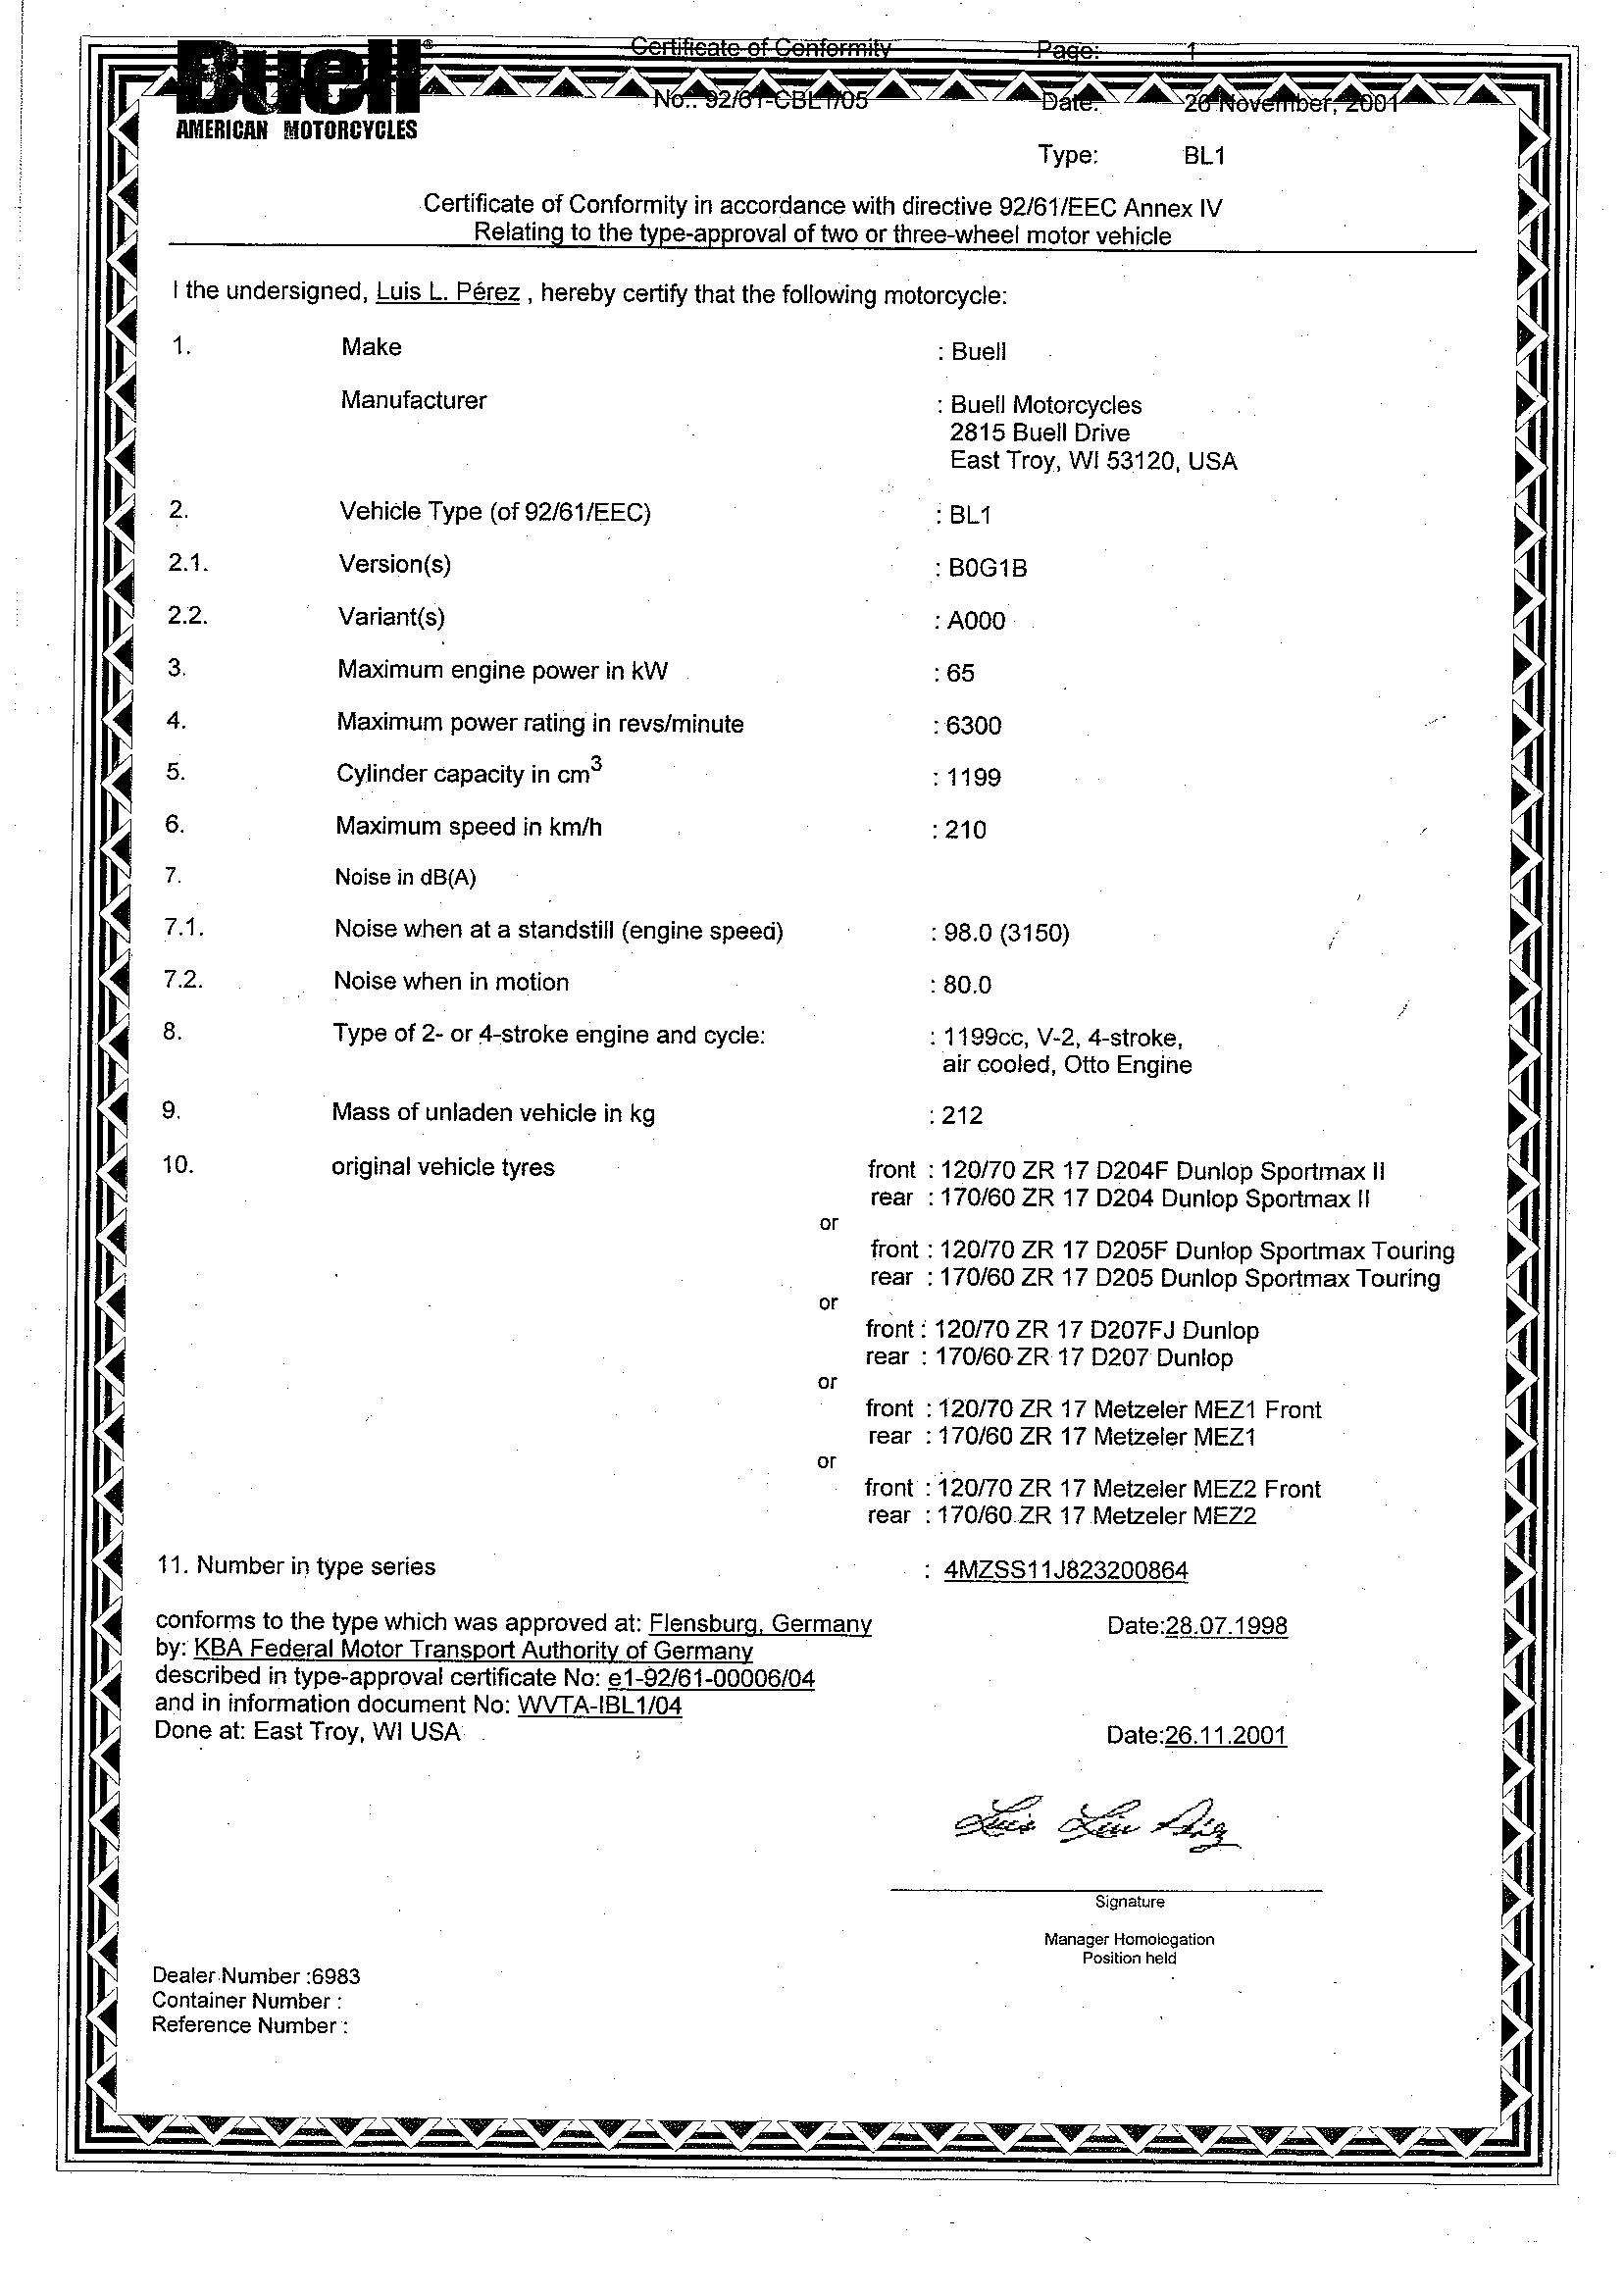 harley dating certificat)